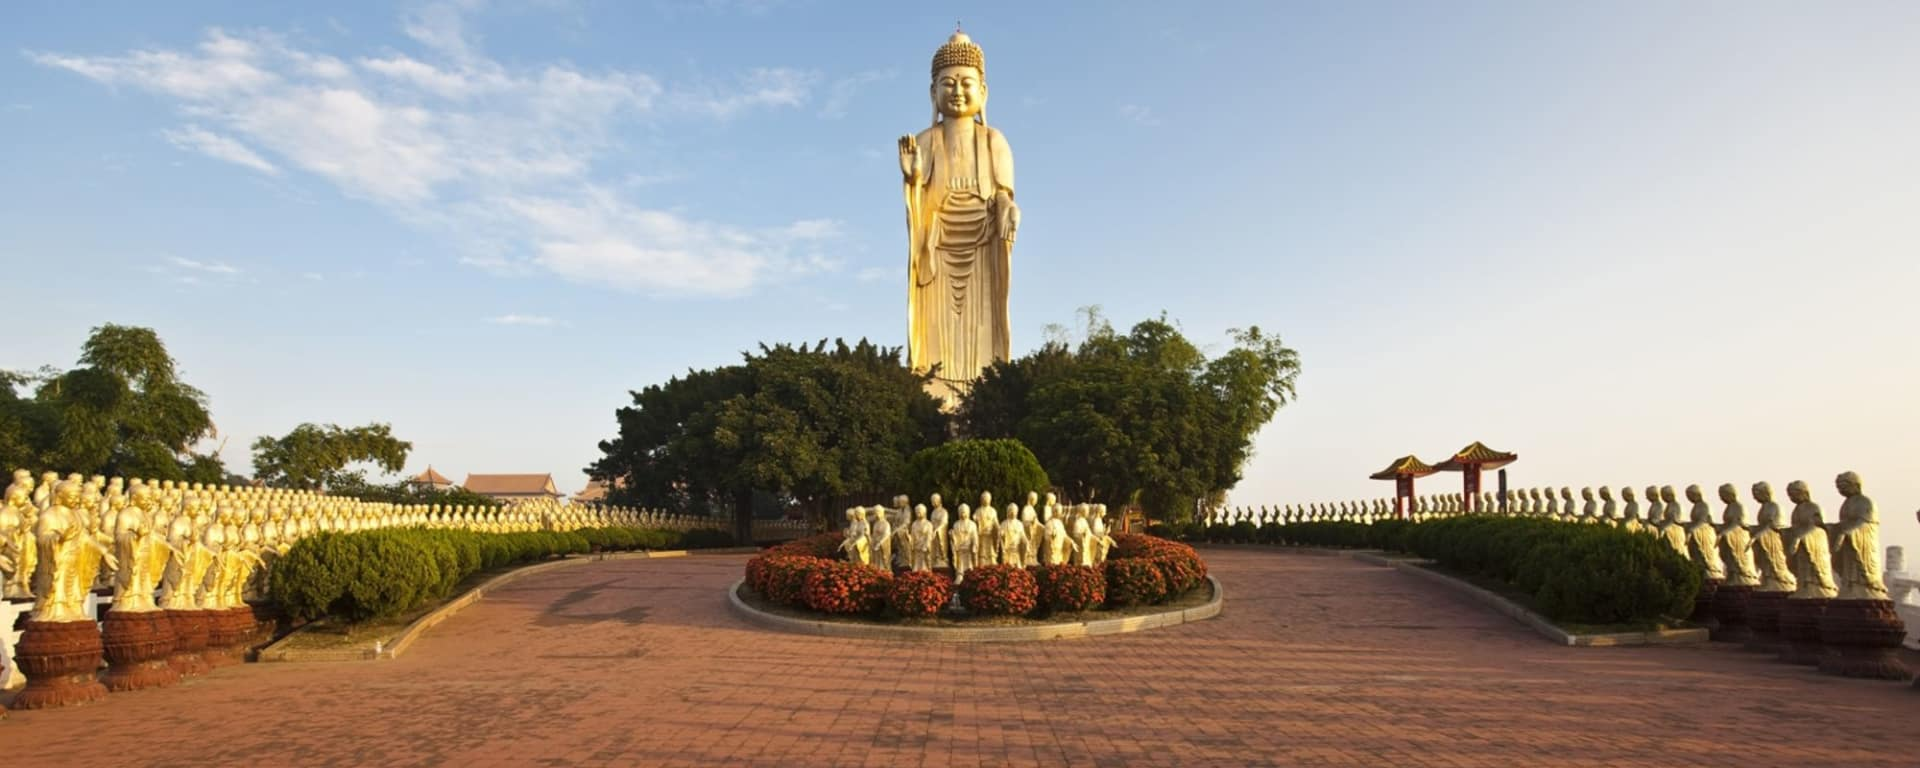 Voyages en Taïwan | Vacances en Asie par tourasia: Fo Guang Shan